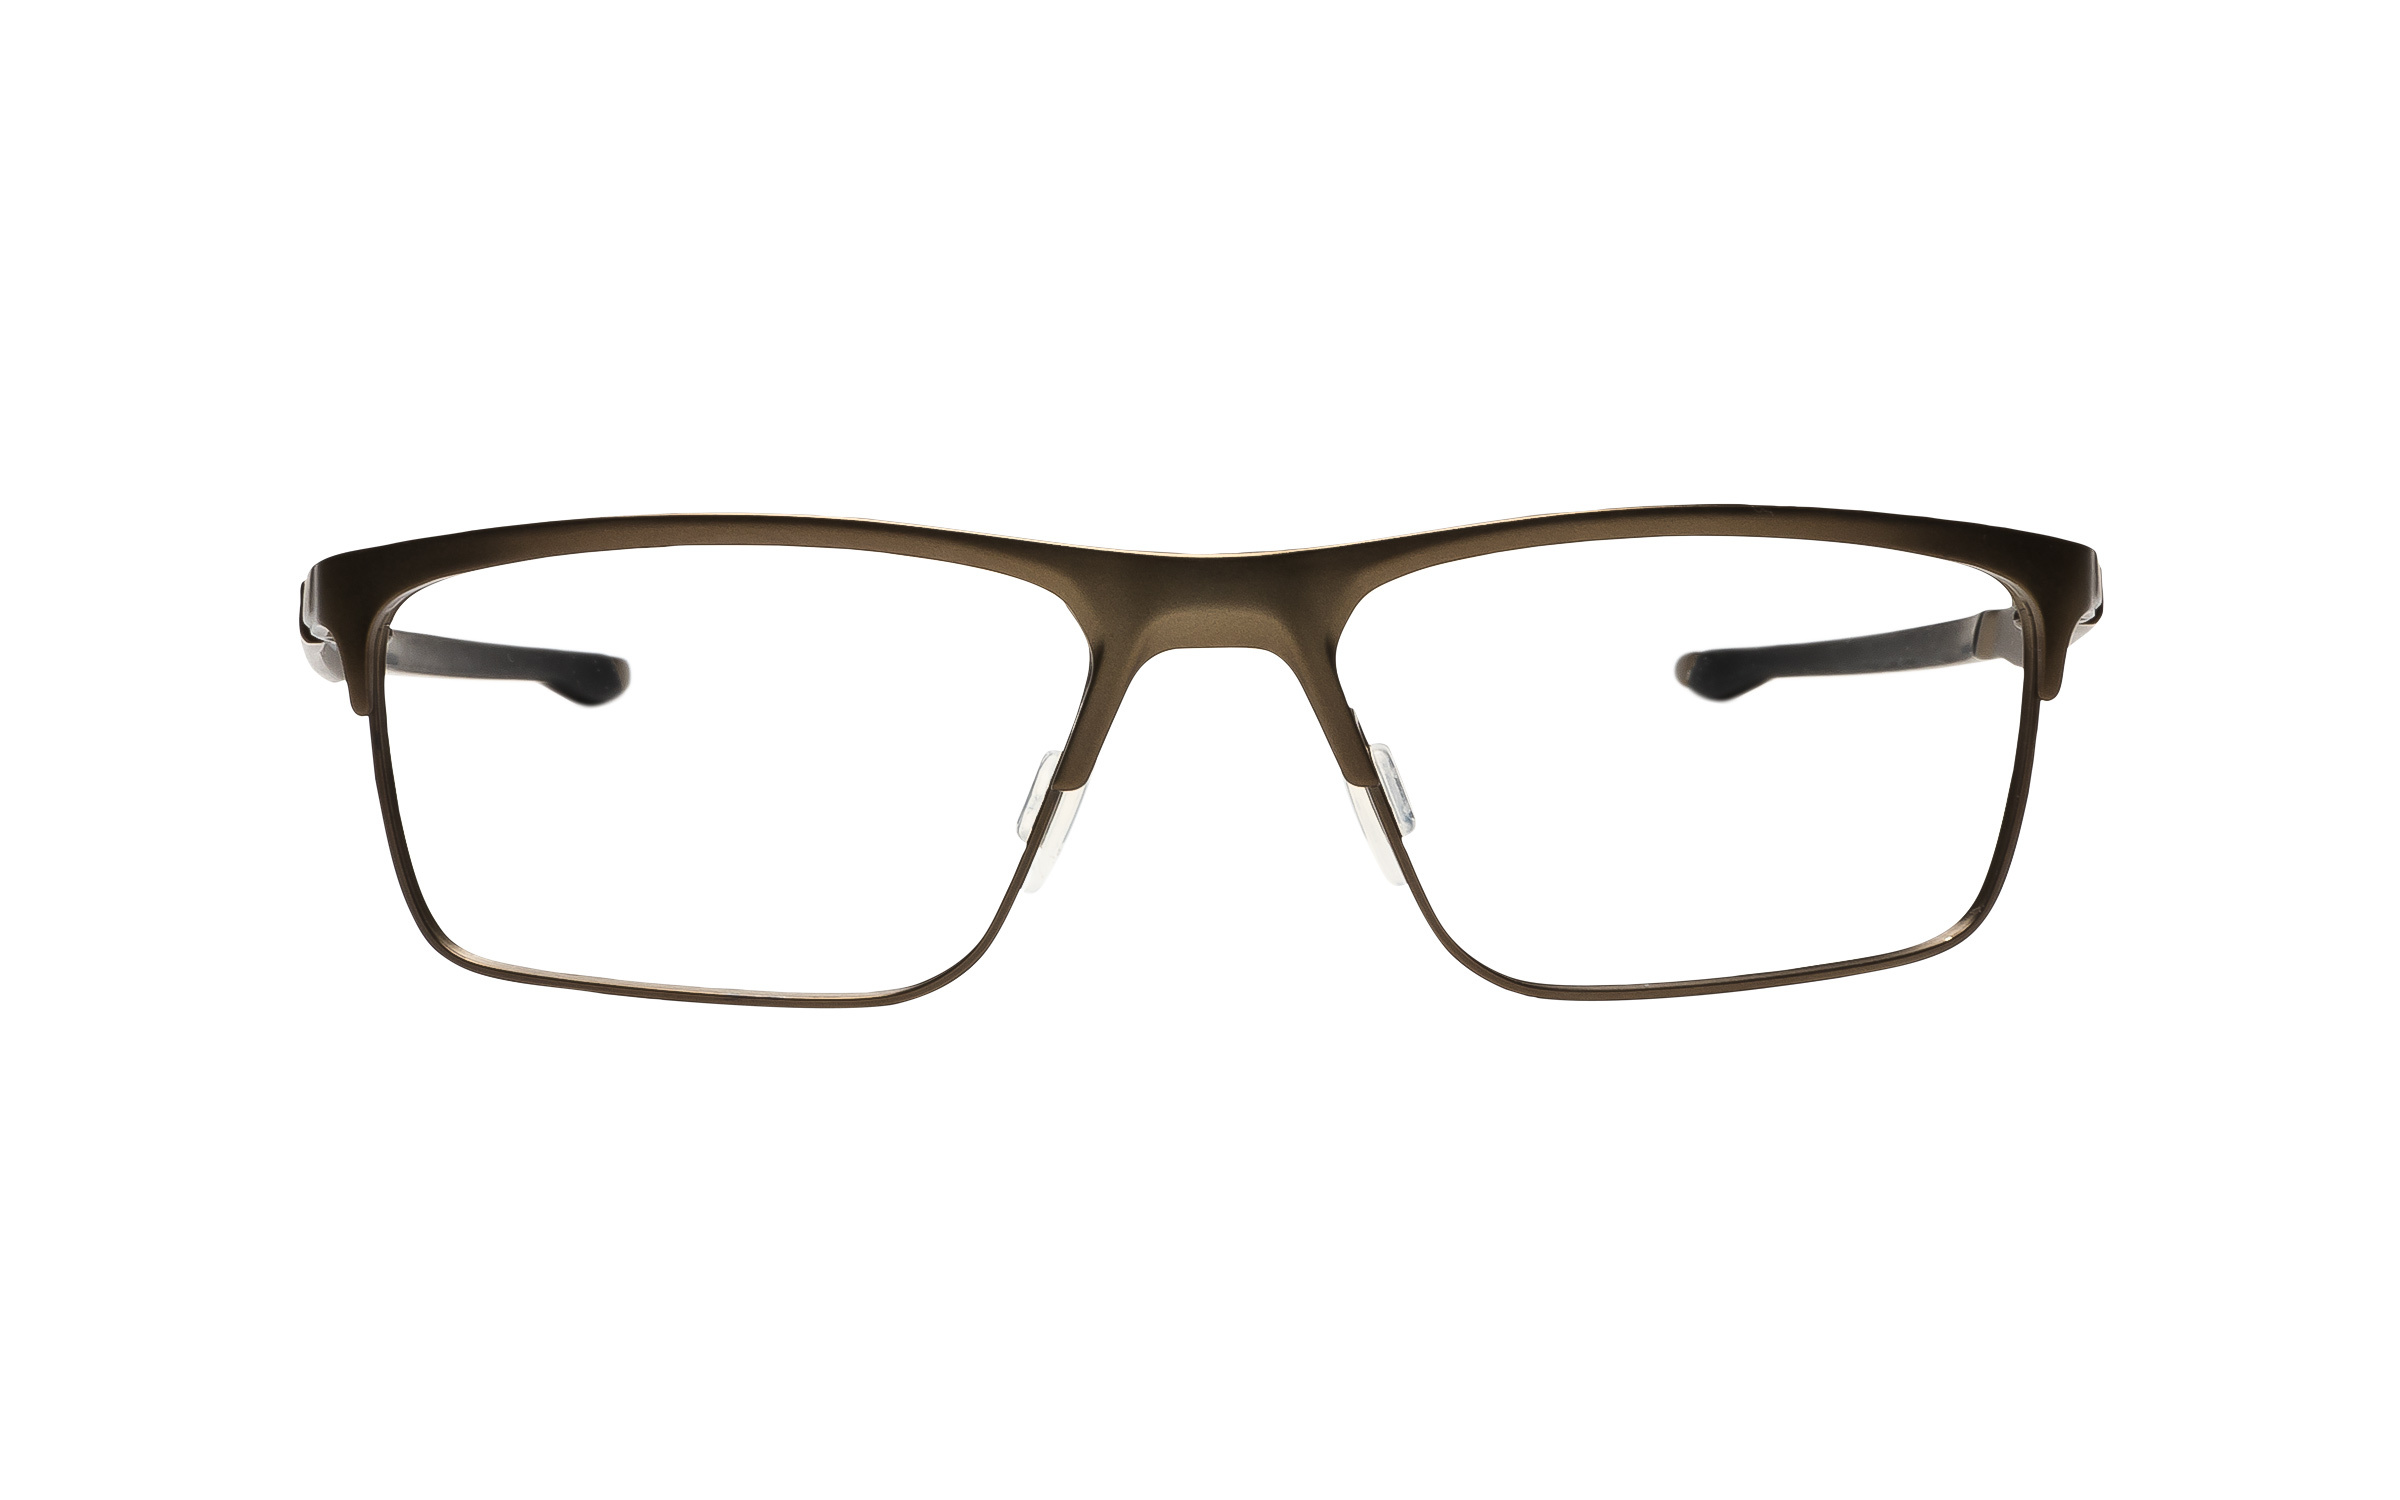 Luxottica Oakley OX5137 02 54 Eyeglasses and Frame in Pewter Grey/Silver | Metal - Online Coastal